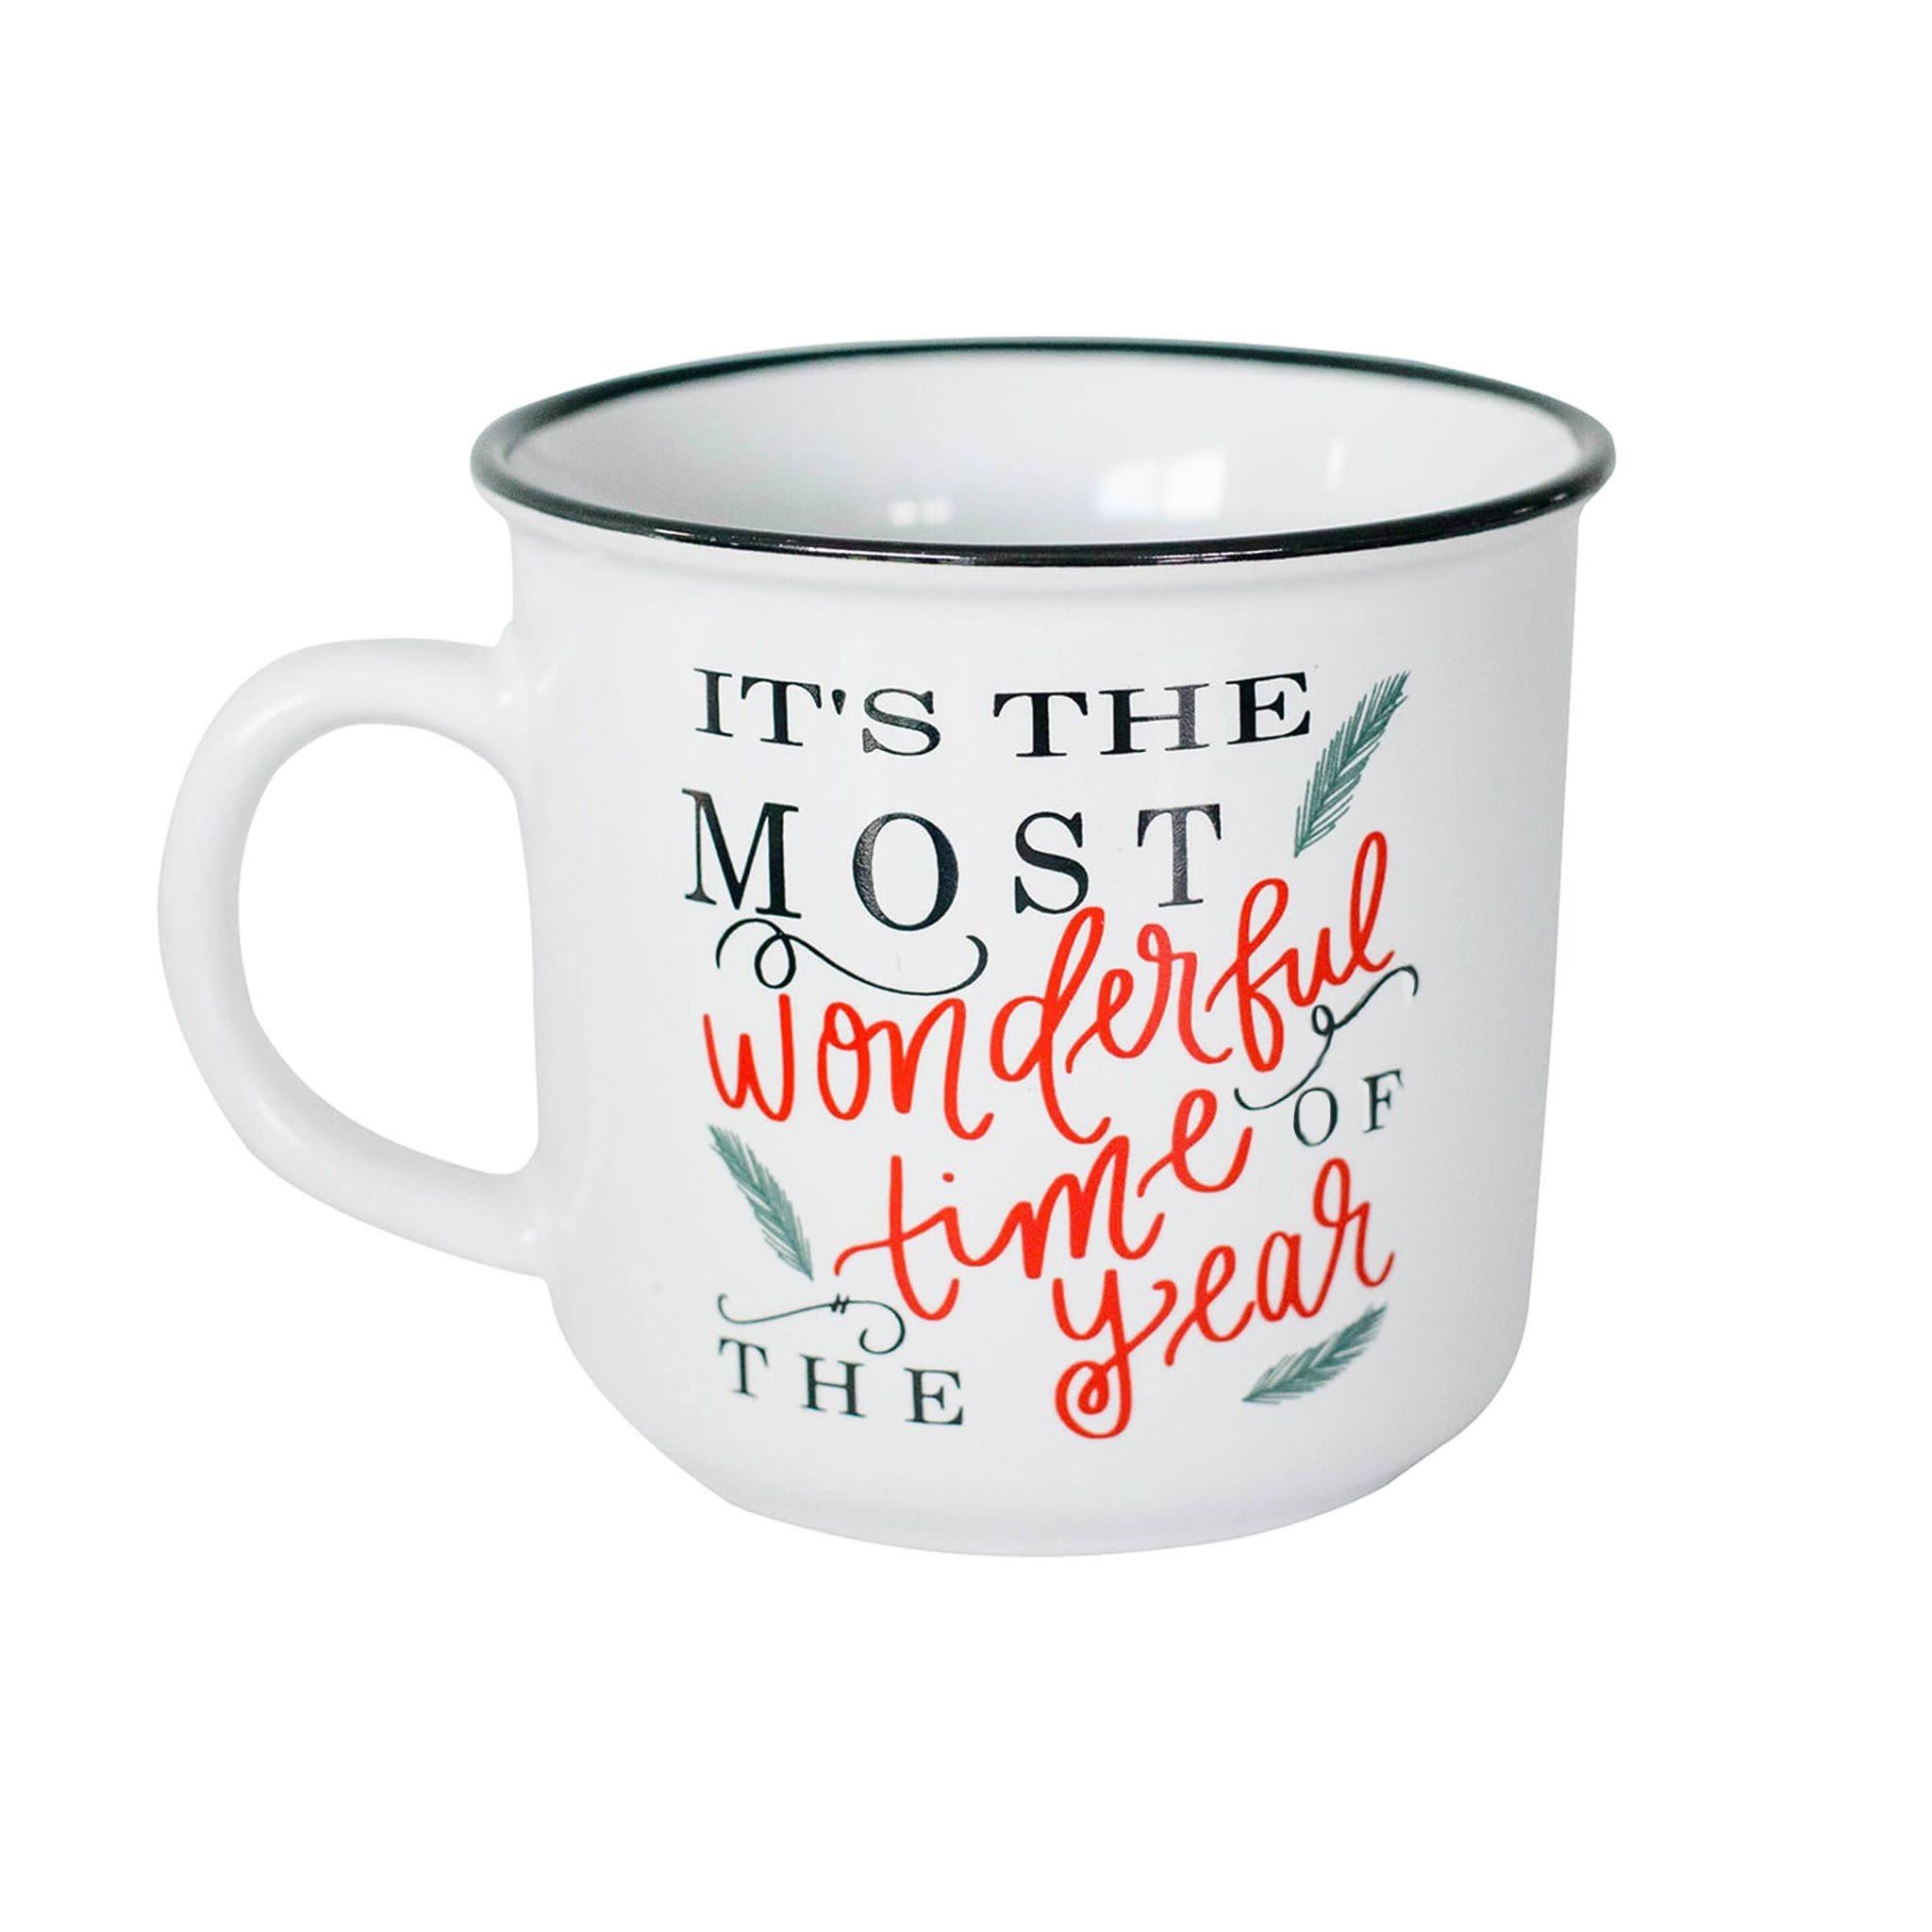 It's The Most Wonderful Campfire Mug